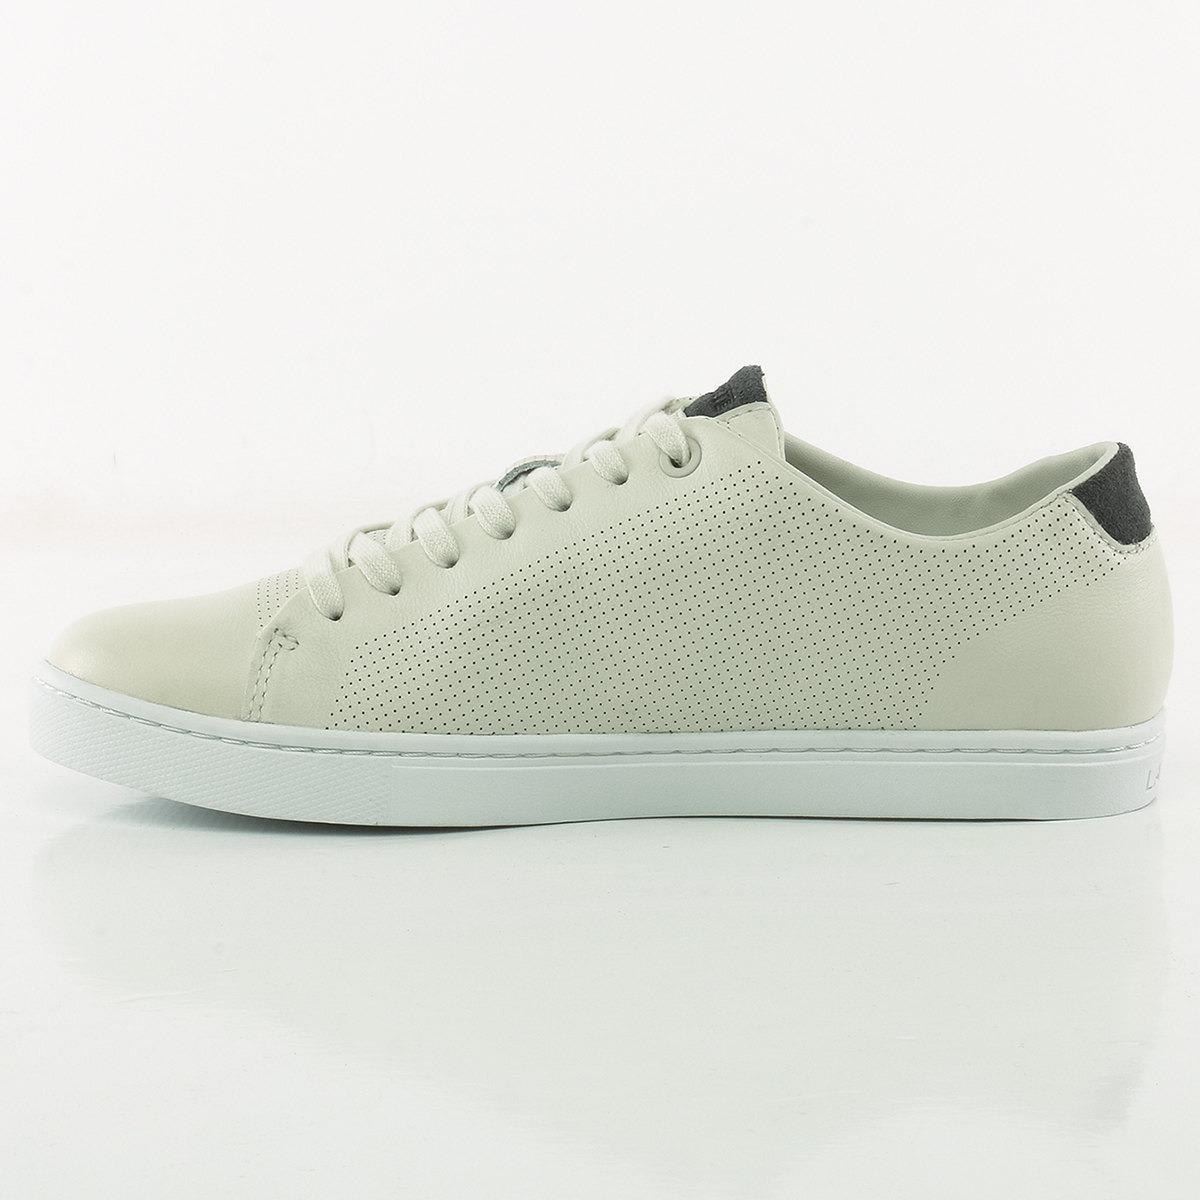 b152feaac61ac zapatillas showcourt 116 lacoste sport 78 tienda oficial. Cargando zoom.